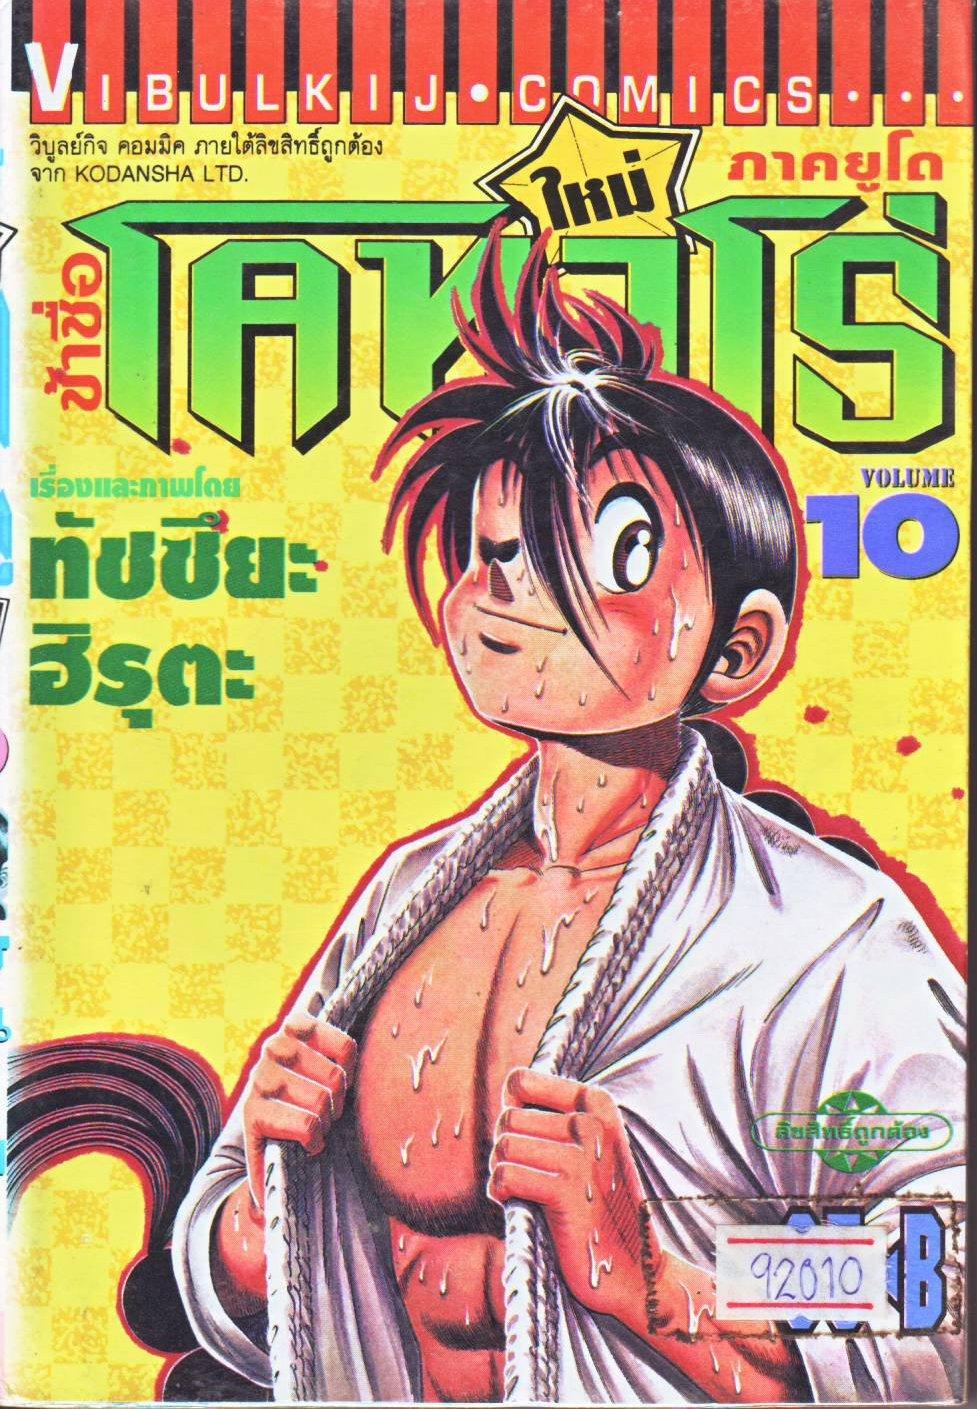 Shin Kotaro Makaritoru!-เล่ม 10